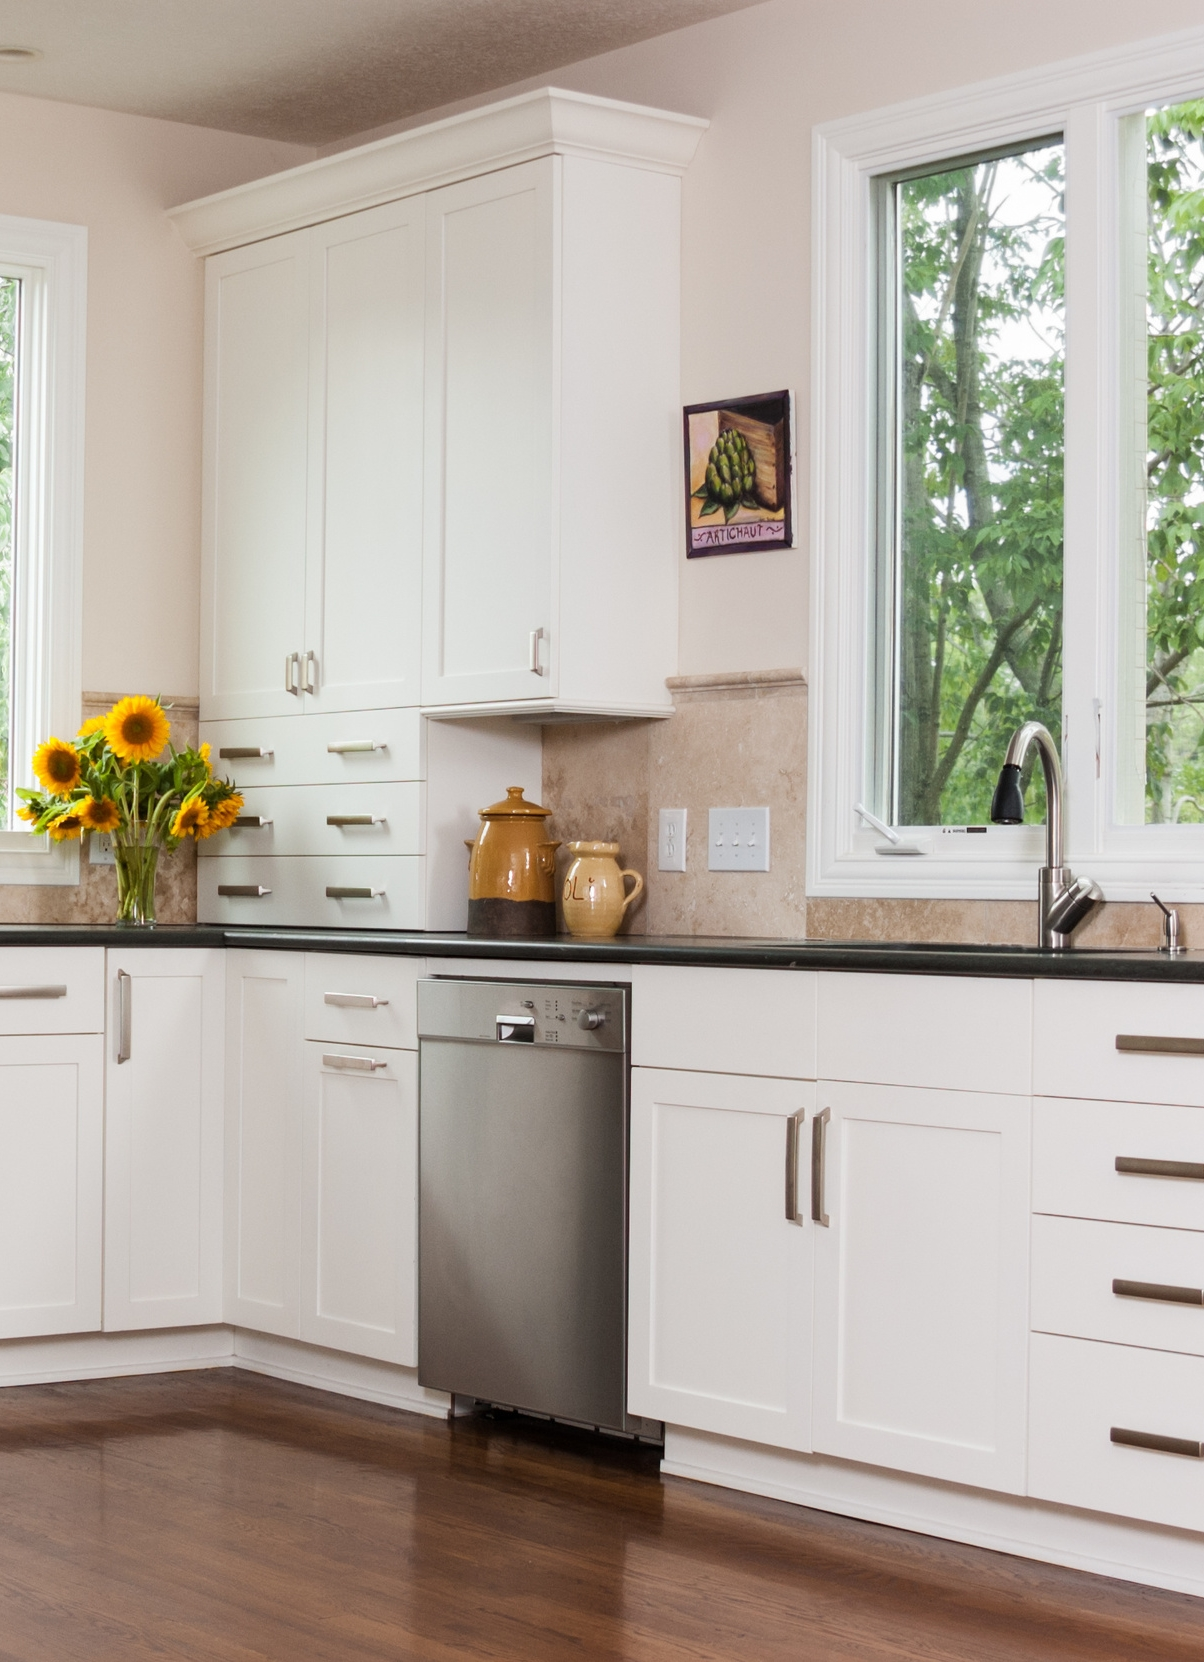 inspiring-home-interior-decor-florida-designer-spectacular-spaces-55957739.jpg